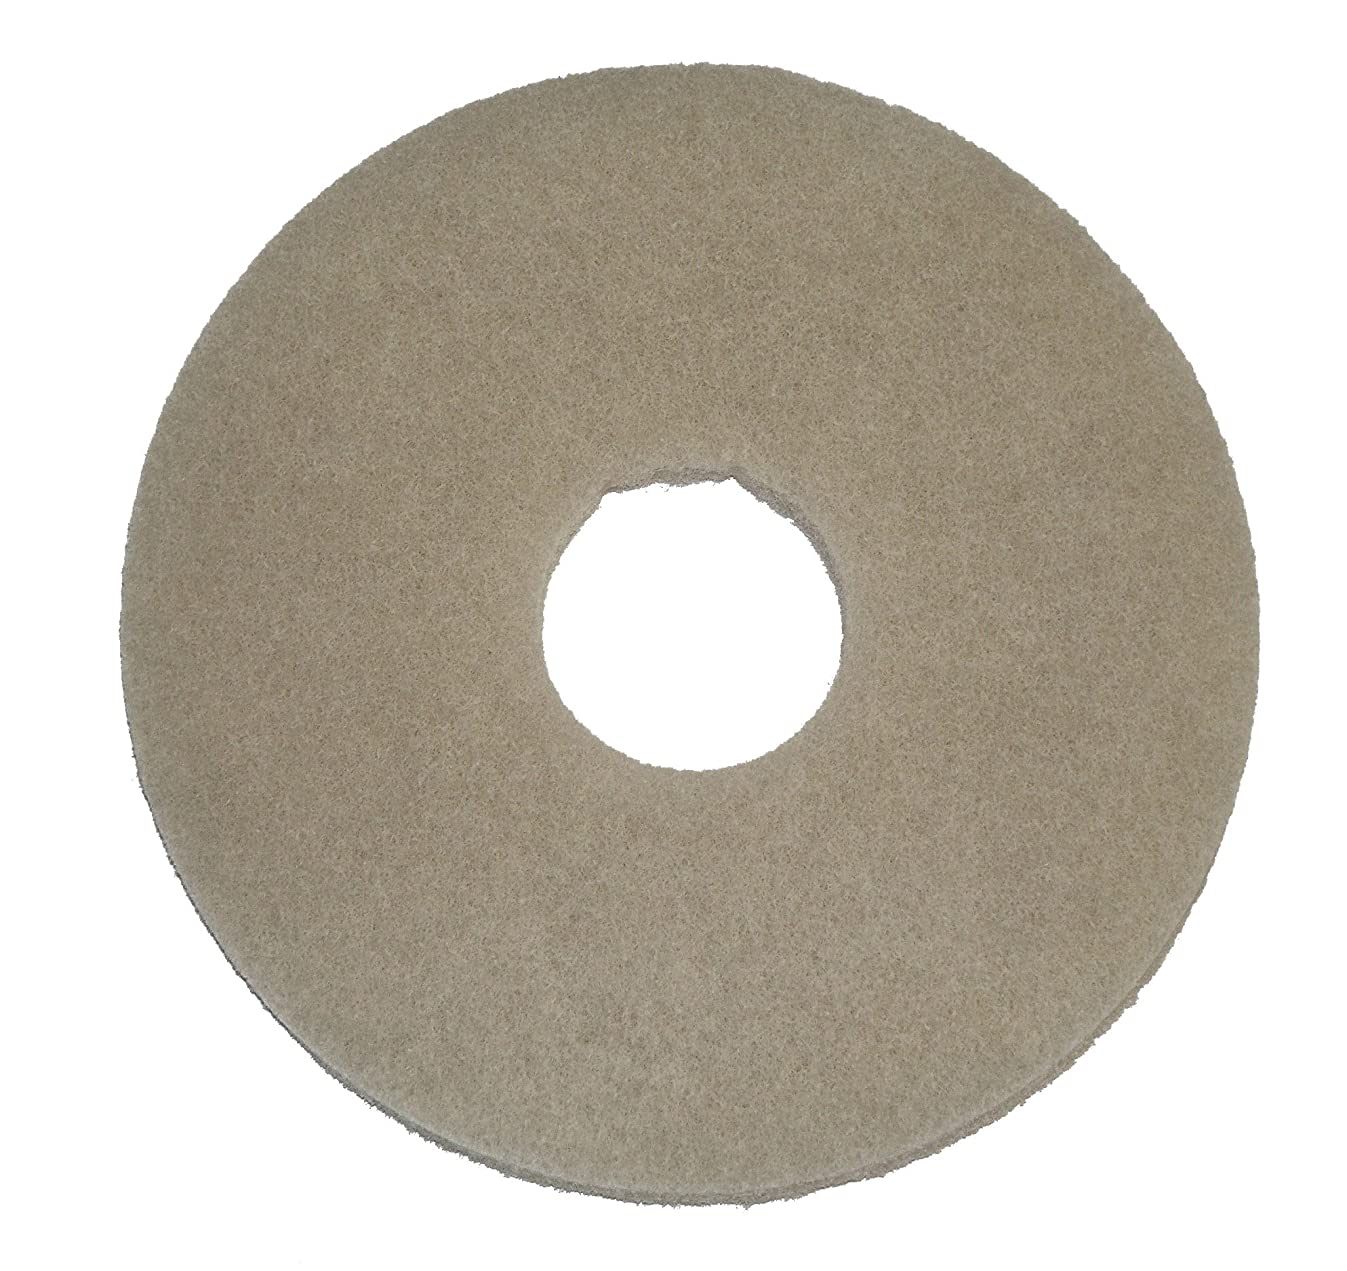 Oreck Commercial 437058 Stone Care Orbiter Pad, 12